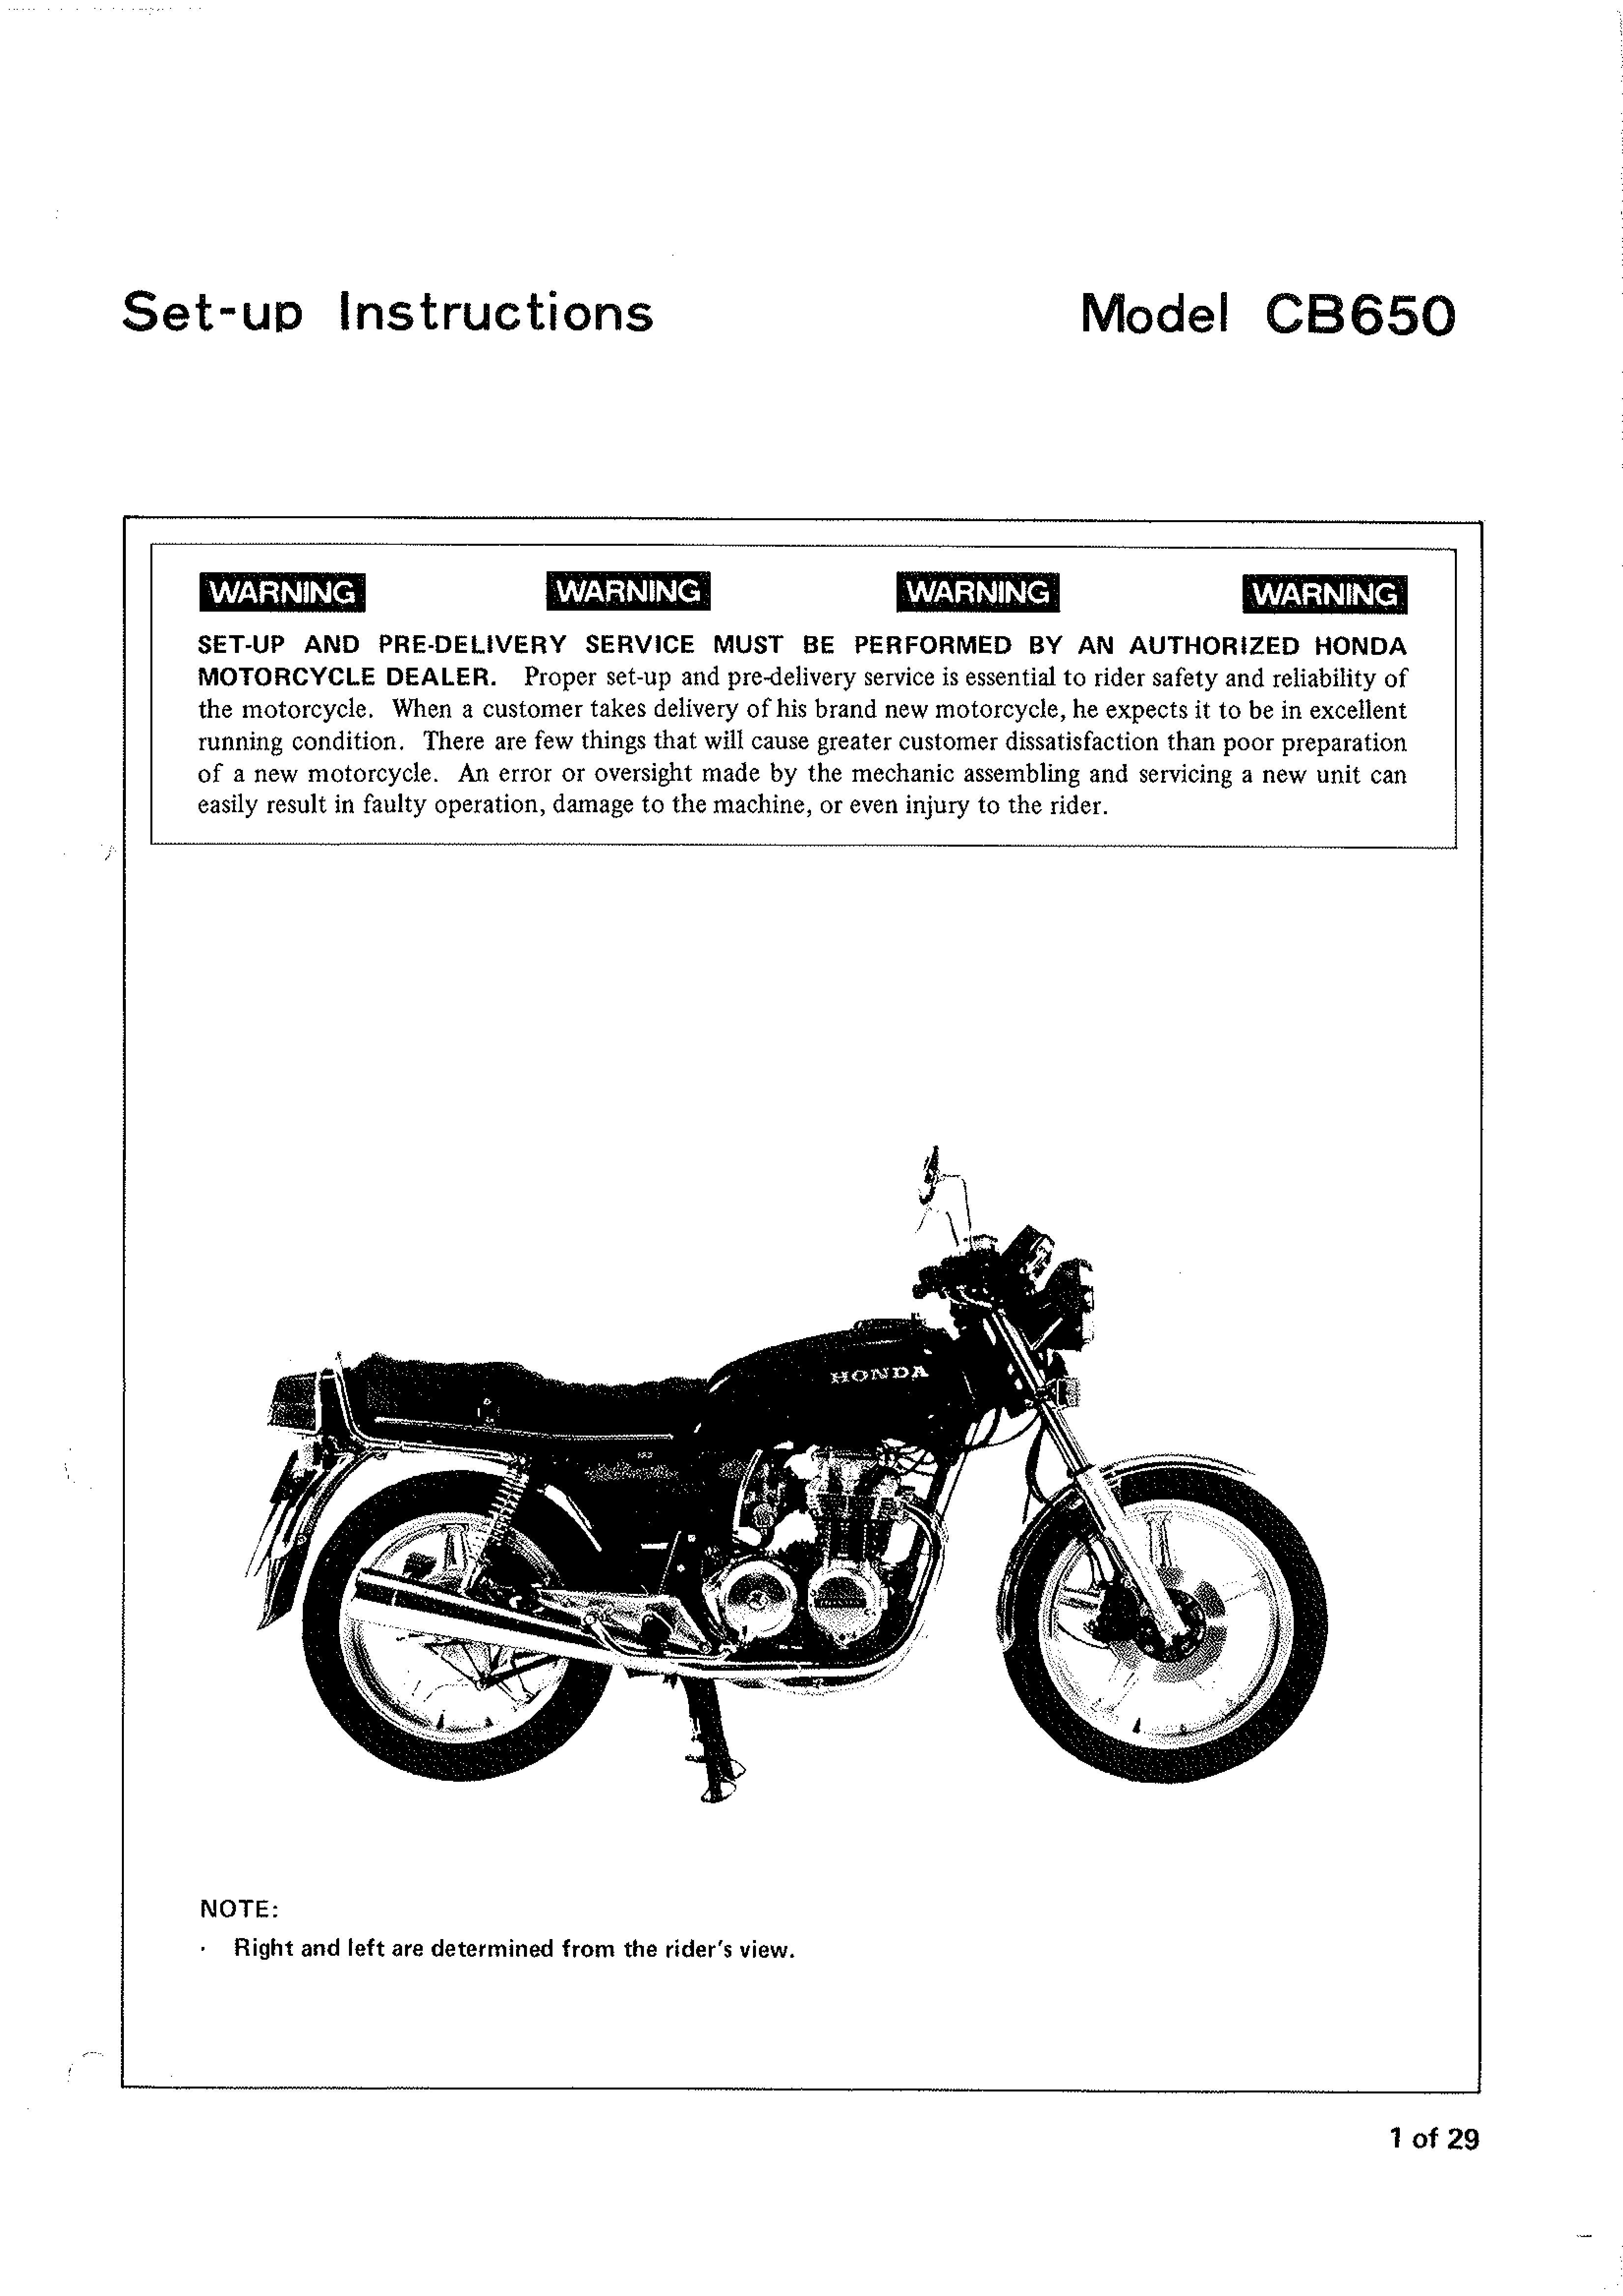 Setup Manual for Honda CB650